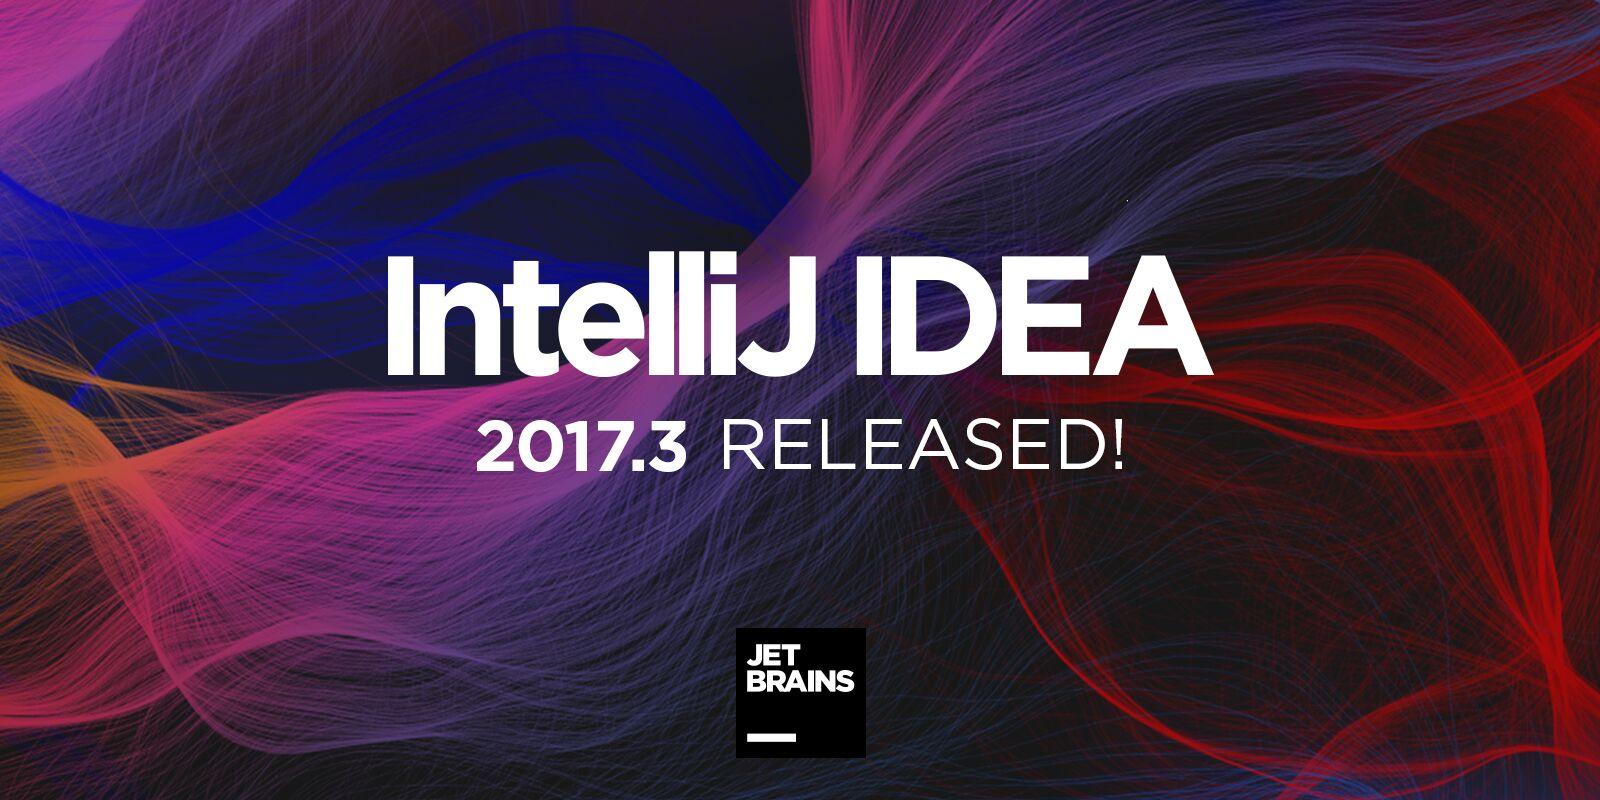 IntelliJ IDEA 2017.3. Что нового и интересного?